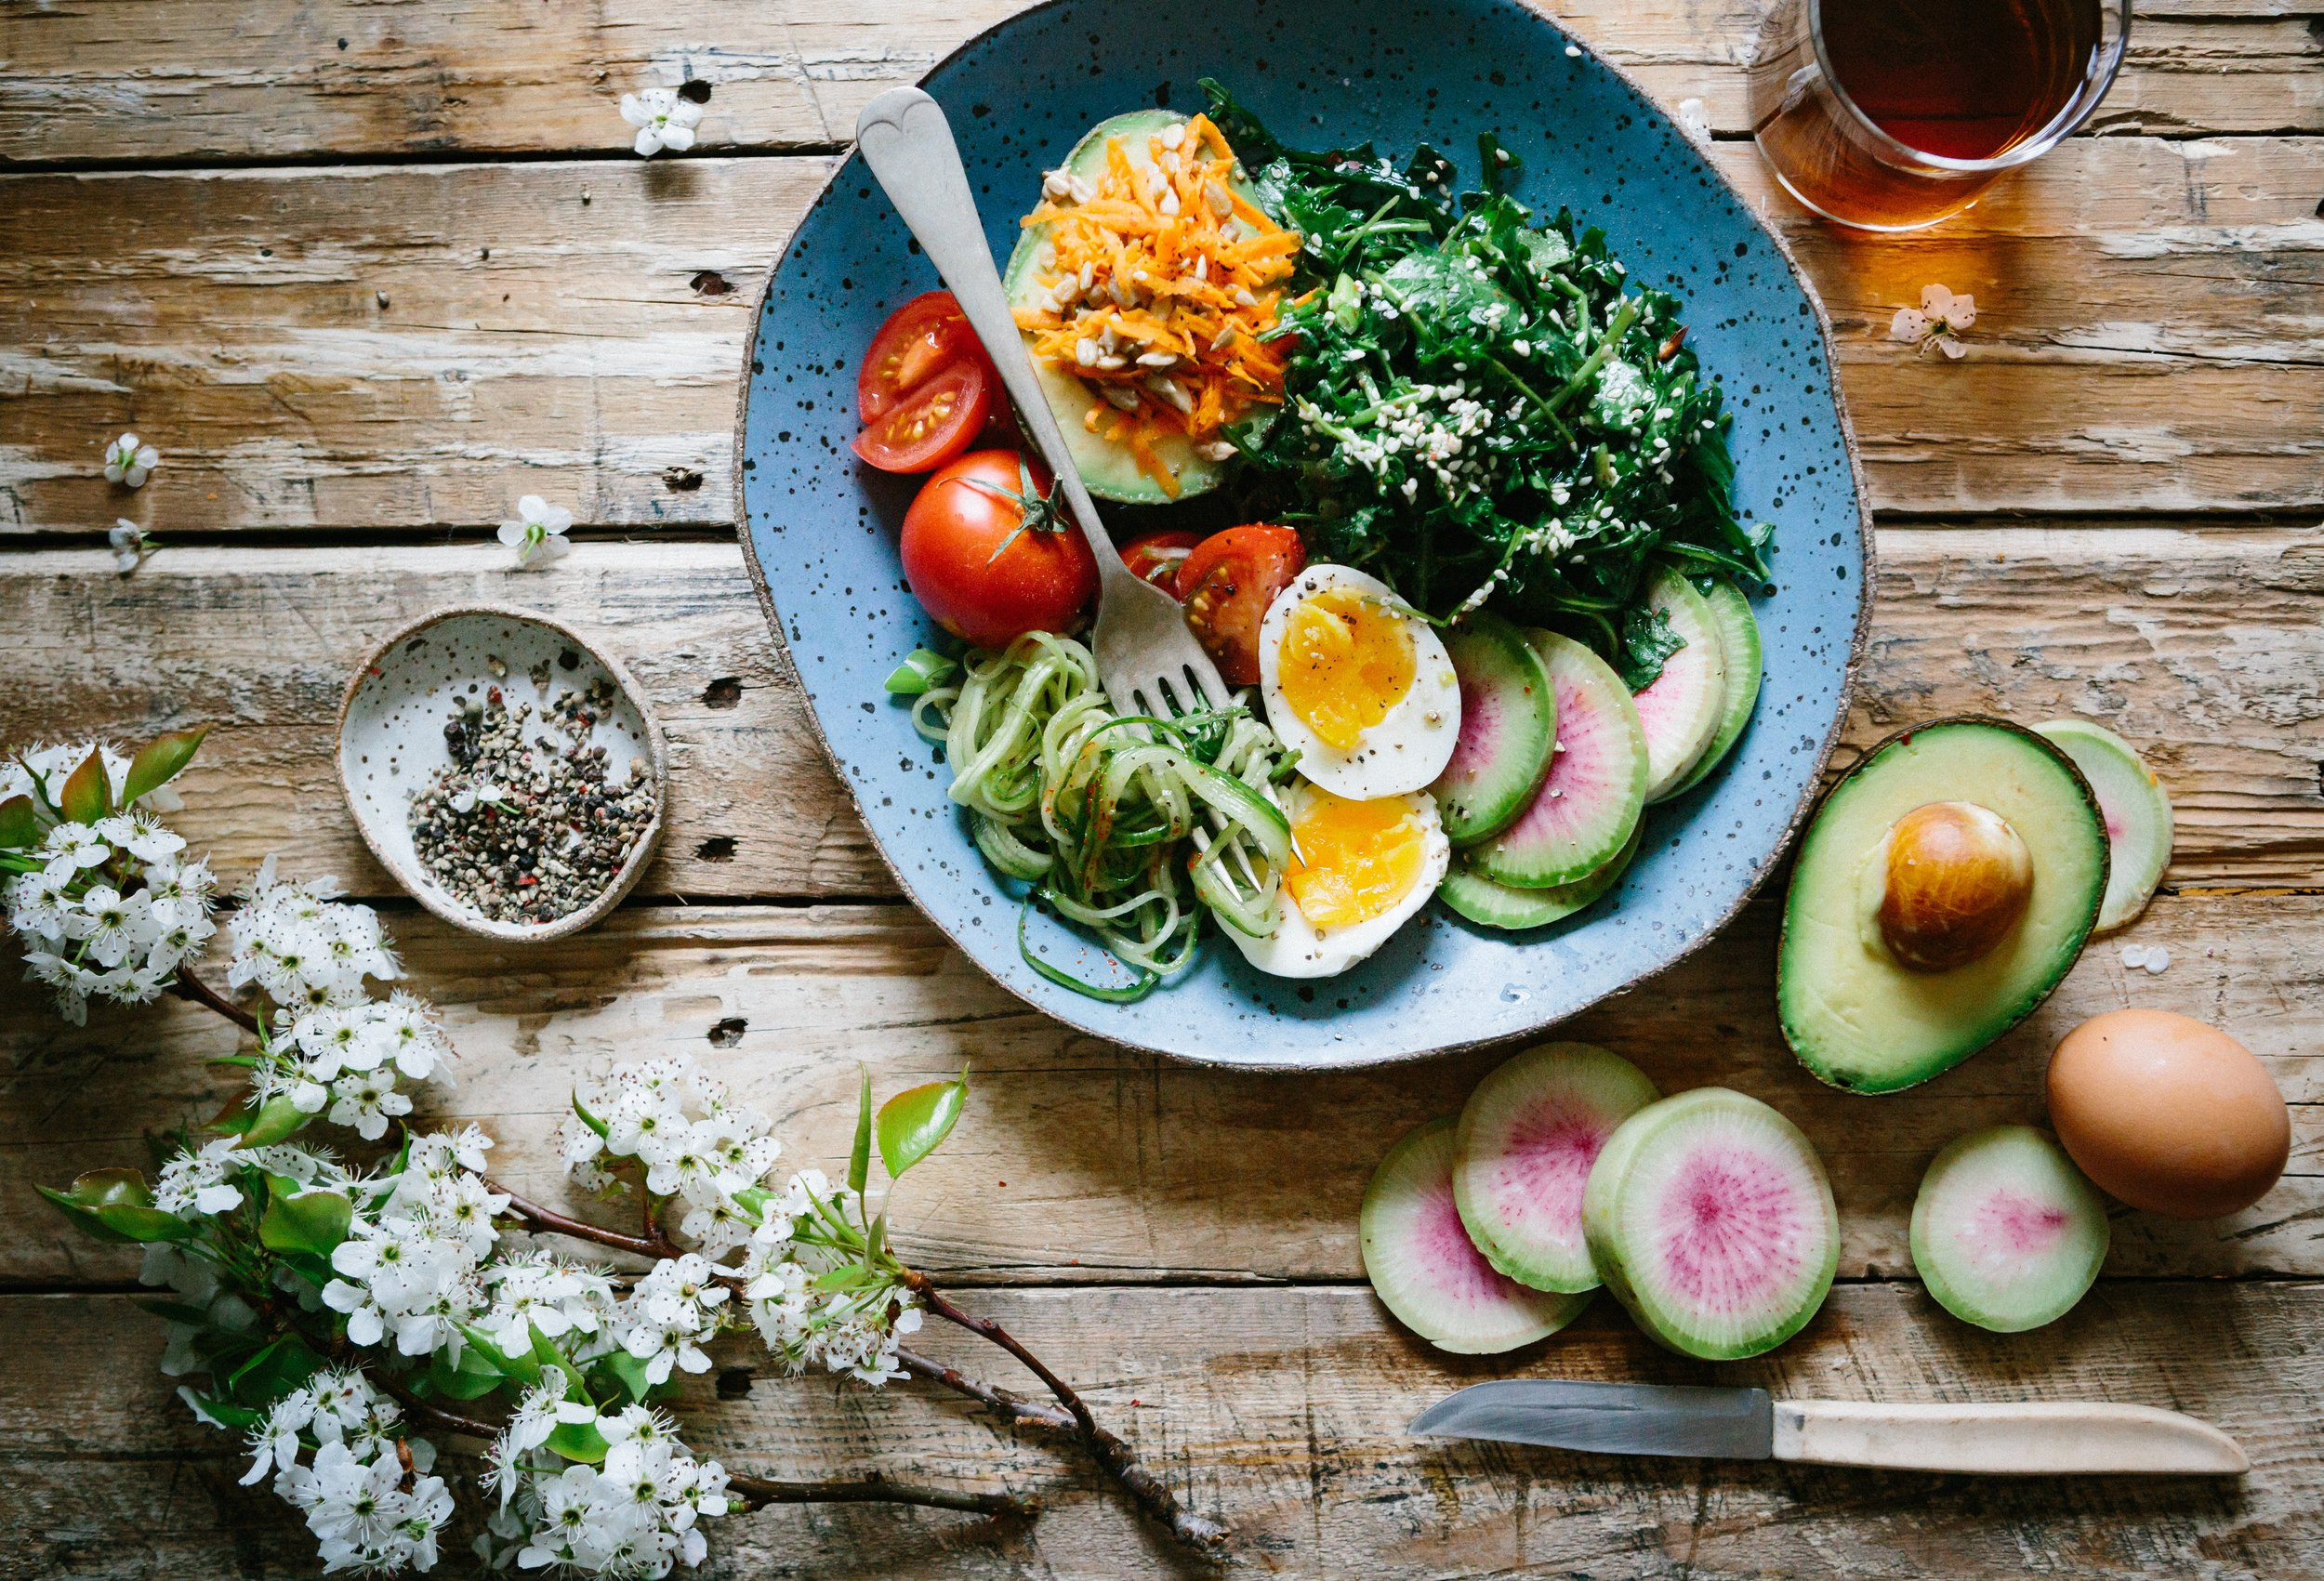 brenda villa food nourish meal feed yourself